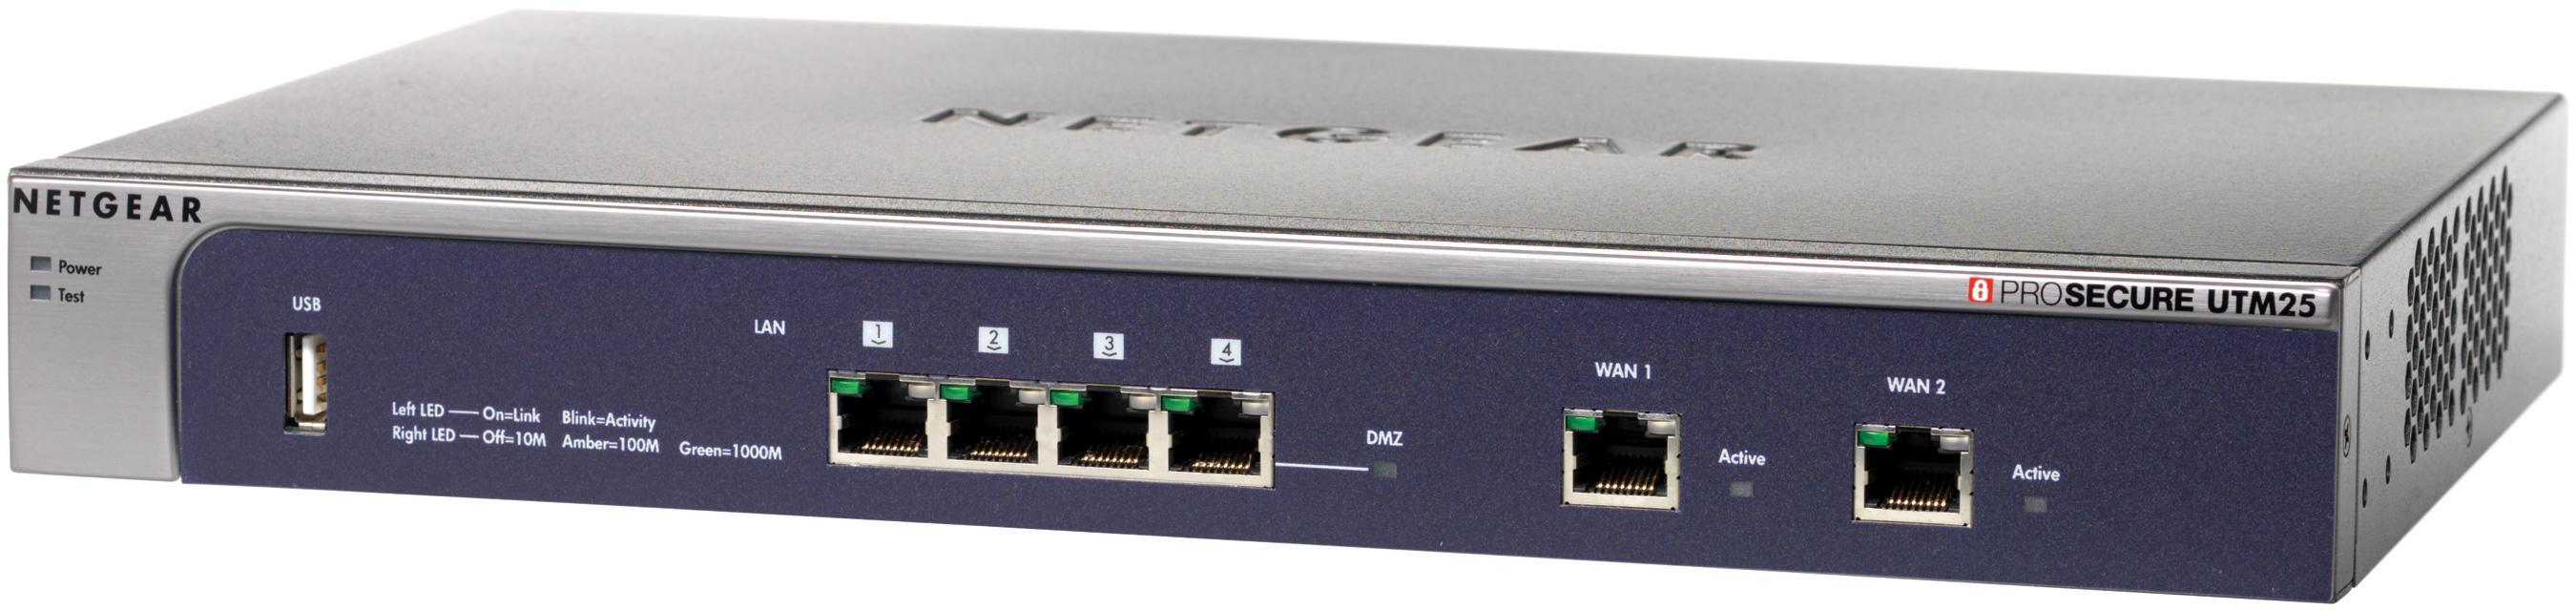 Netgear ProSecure UTM25s VDSL Kit Appliance with VDSL A Bundle 1 Year (Licence Only)